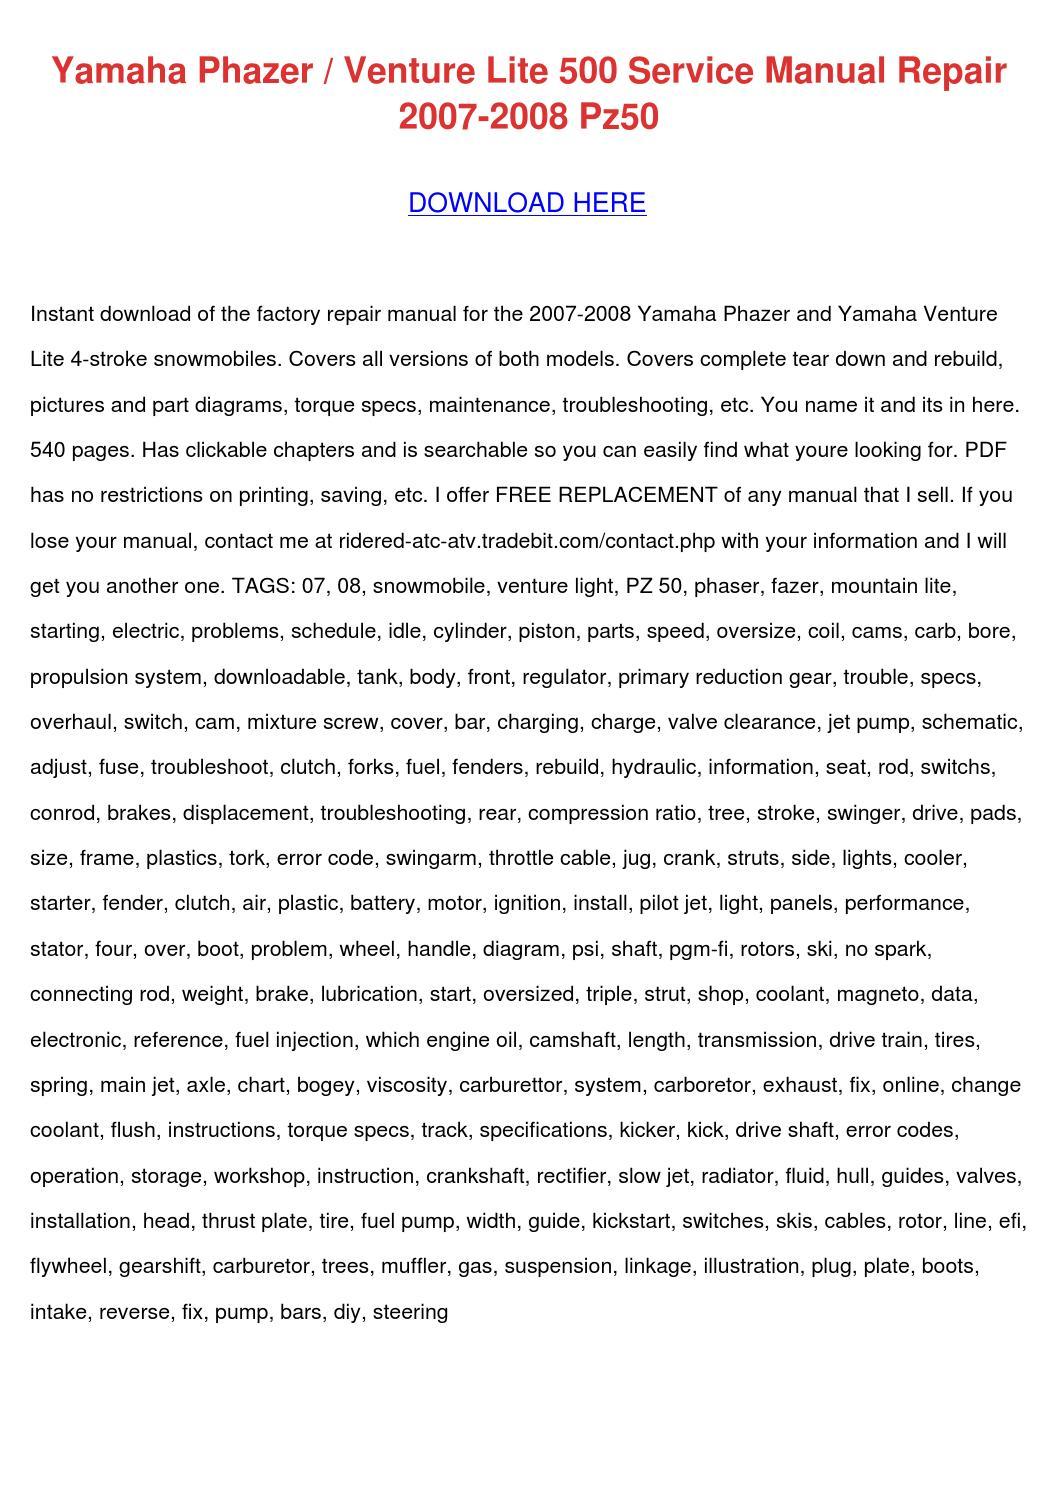 hight resolution of yamaha phazer venture lite 500 service manual